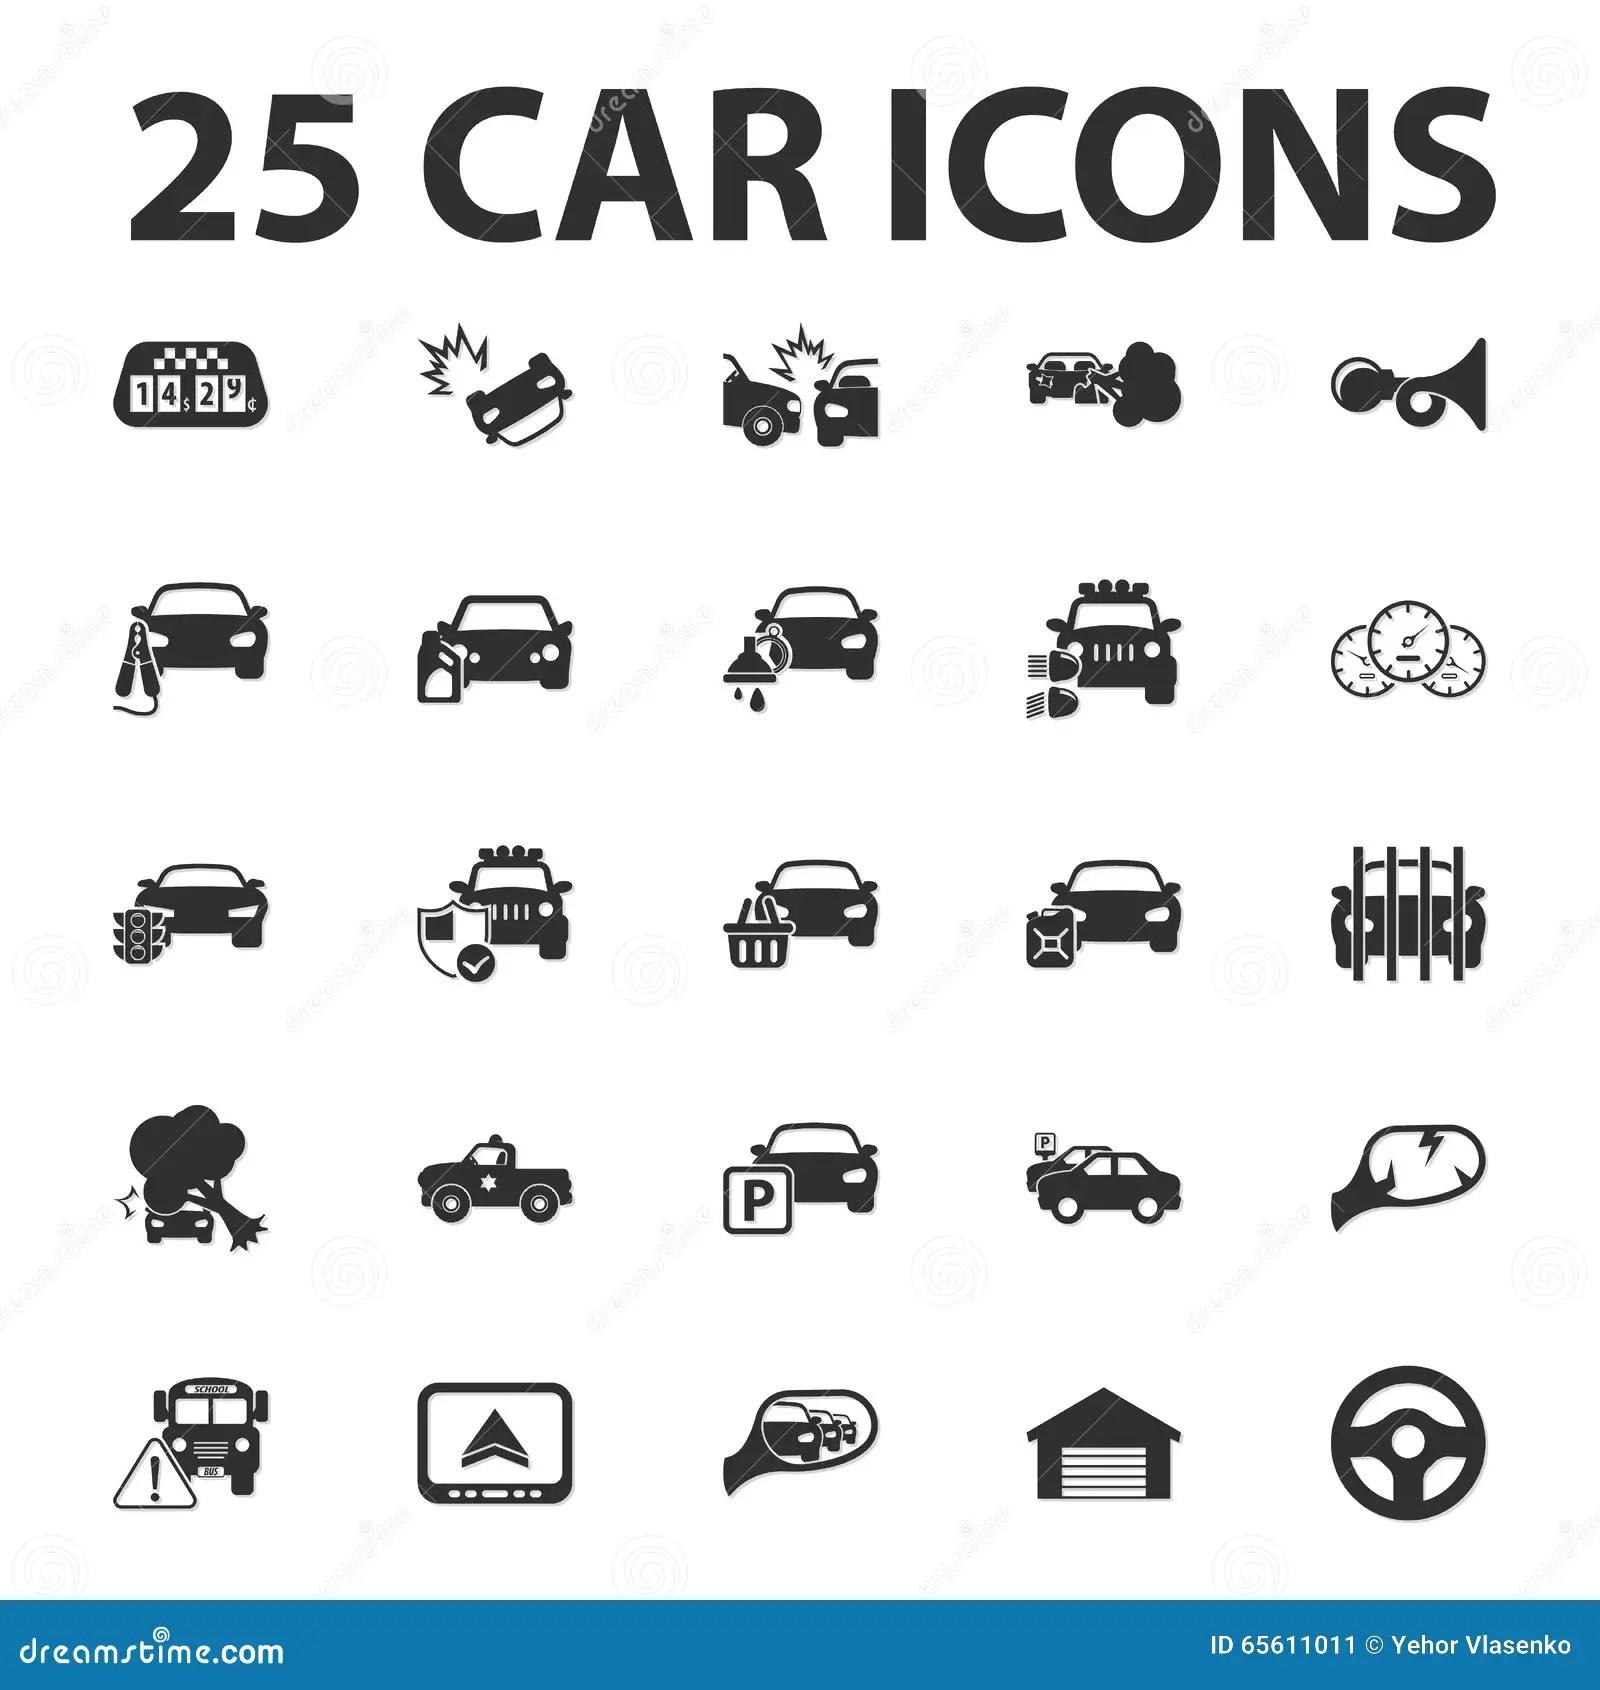 Car Repair 25 Black Simple Icons Set For Web Stock Vector